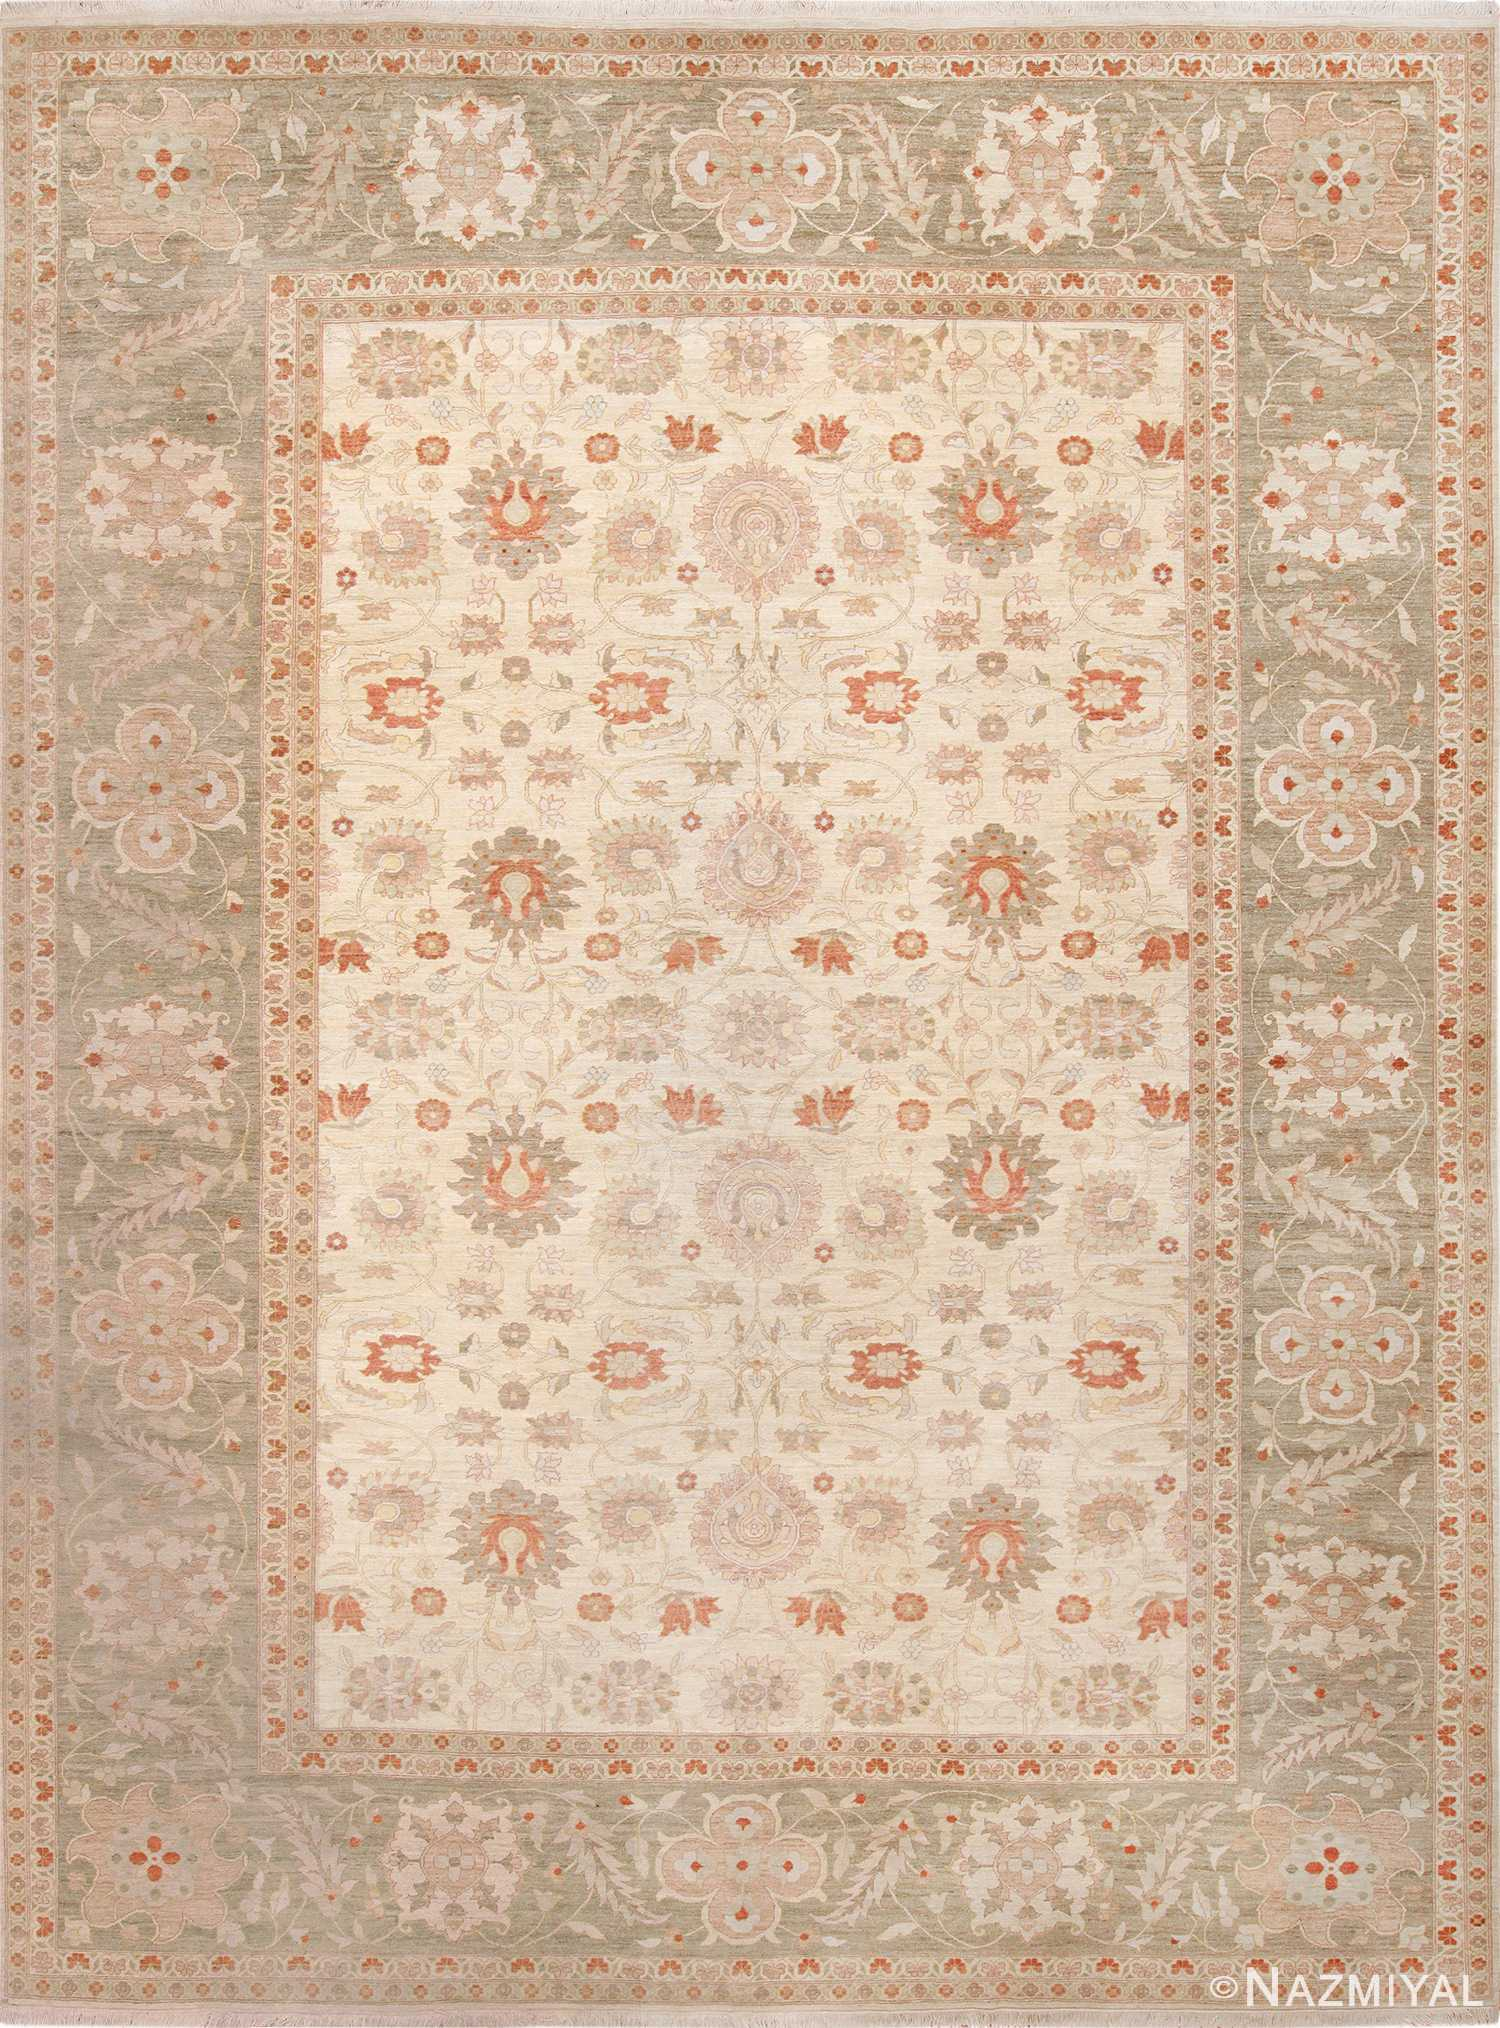 Large Persian Tabriz Design Modern Egyptian Rug 49805 - Nazmiyal